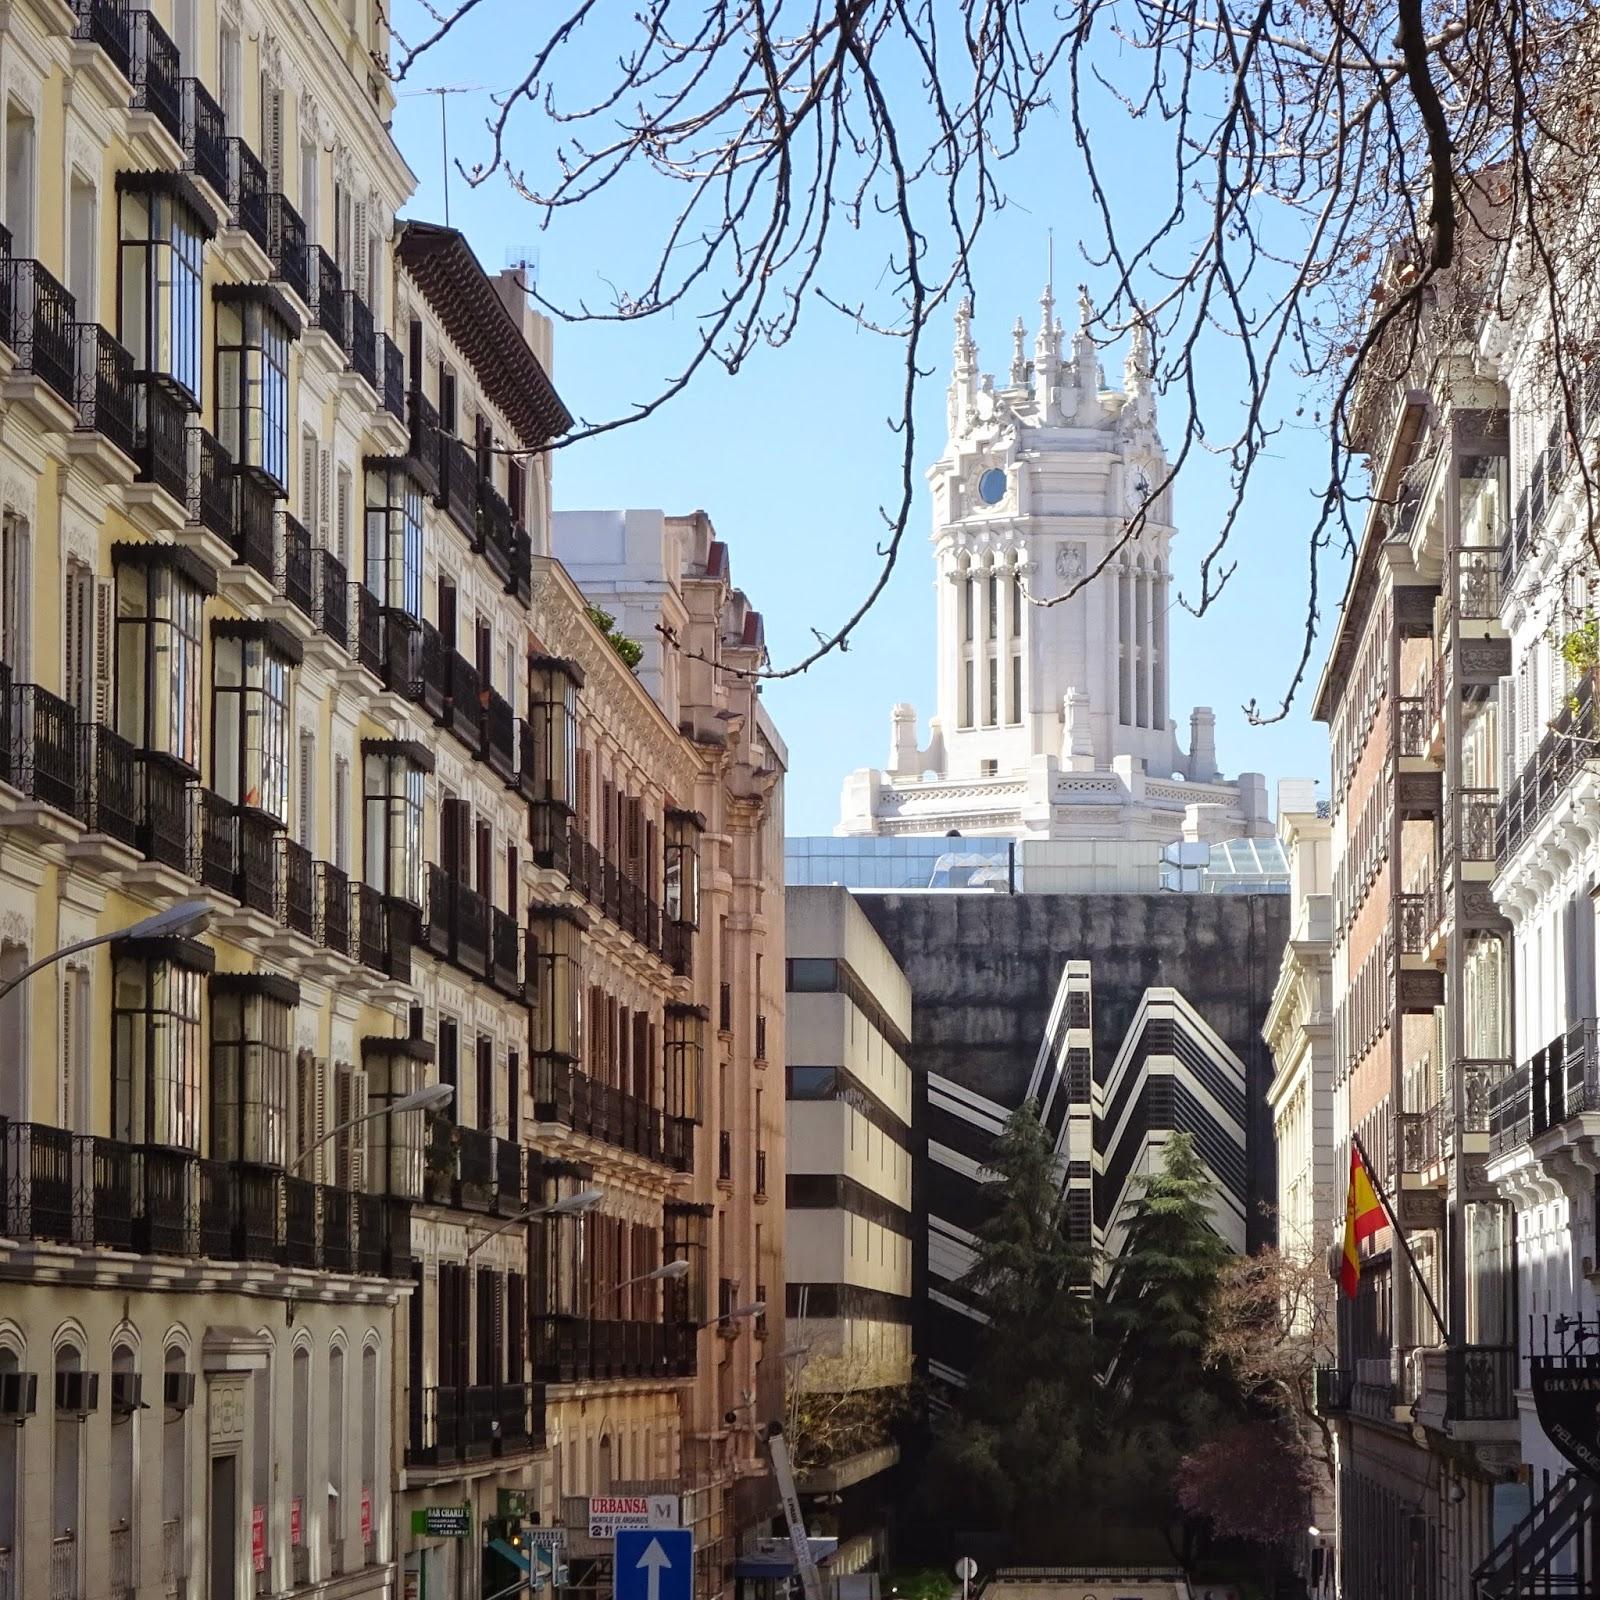 Luciano Fabro parque del Retiro Palacio Velazquez Museo Reina Sofía Madrid Arte Paseo Italia